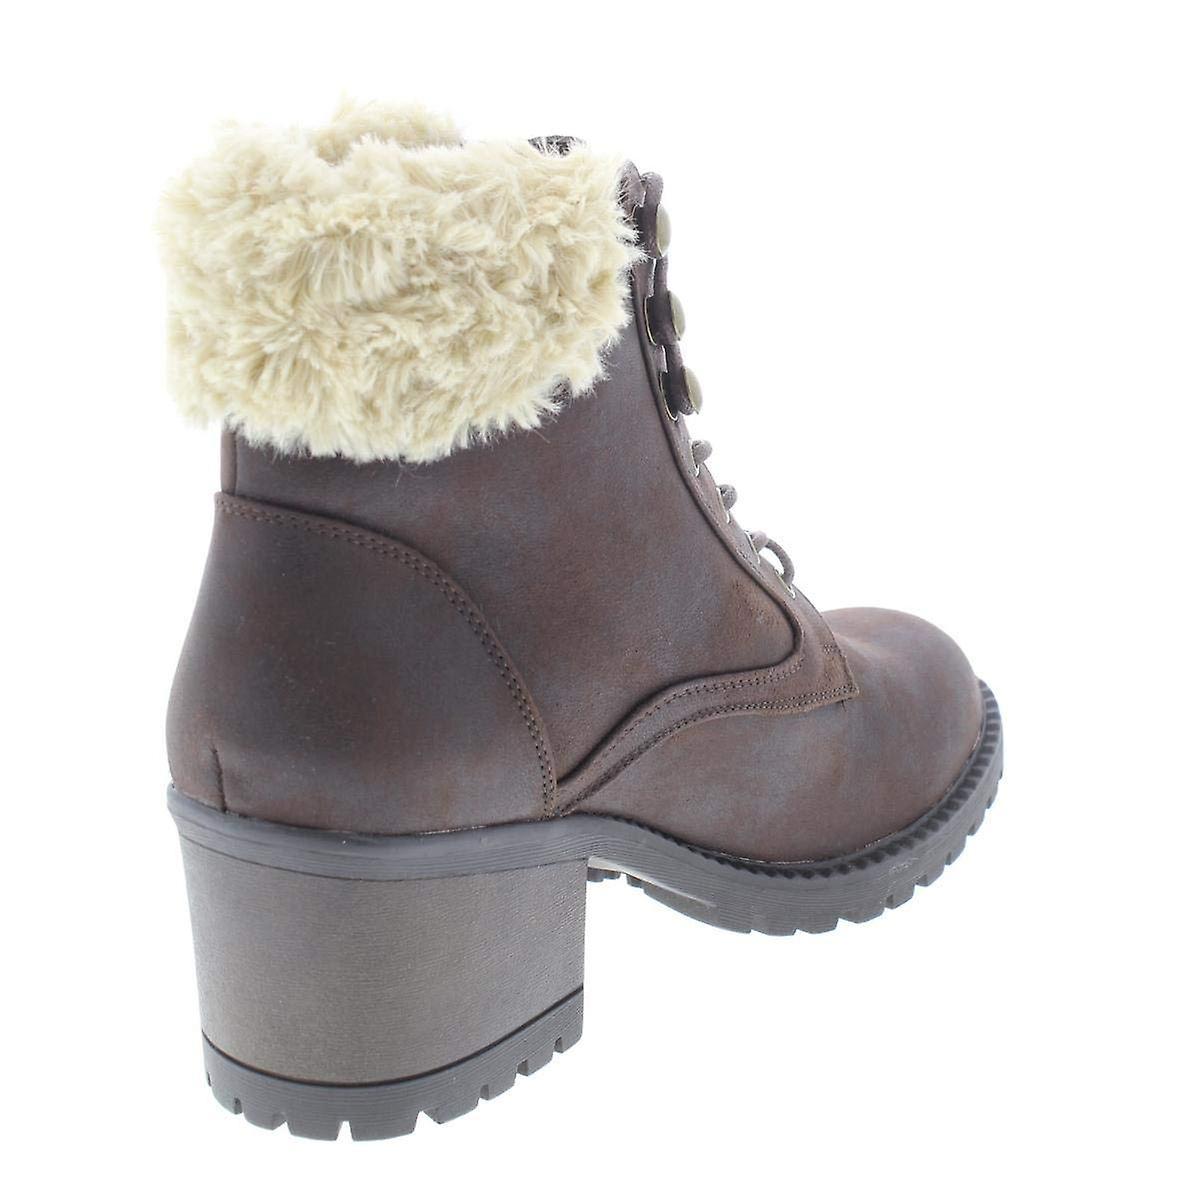 Cliffs Par White Mountain Womens Tori Fabric Round Toe Ankle Fashion Boots